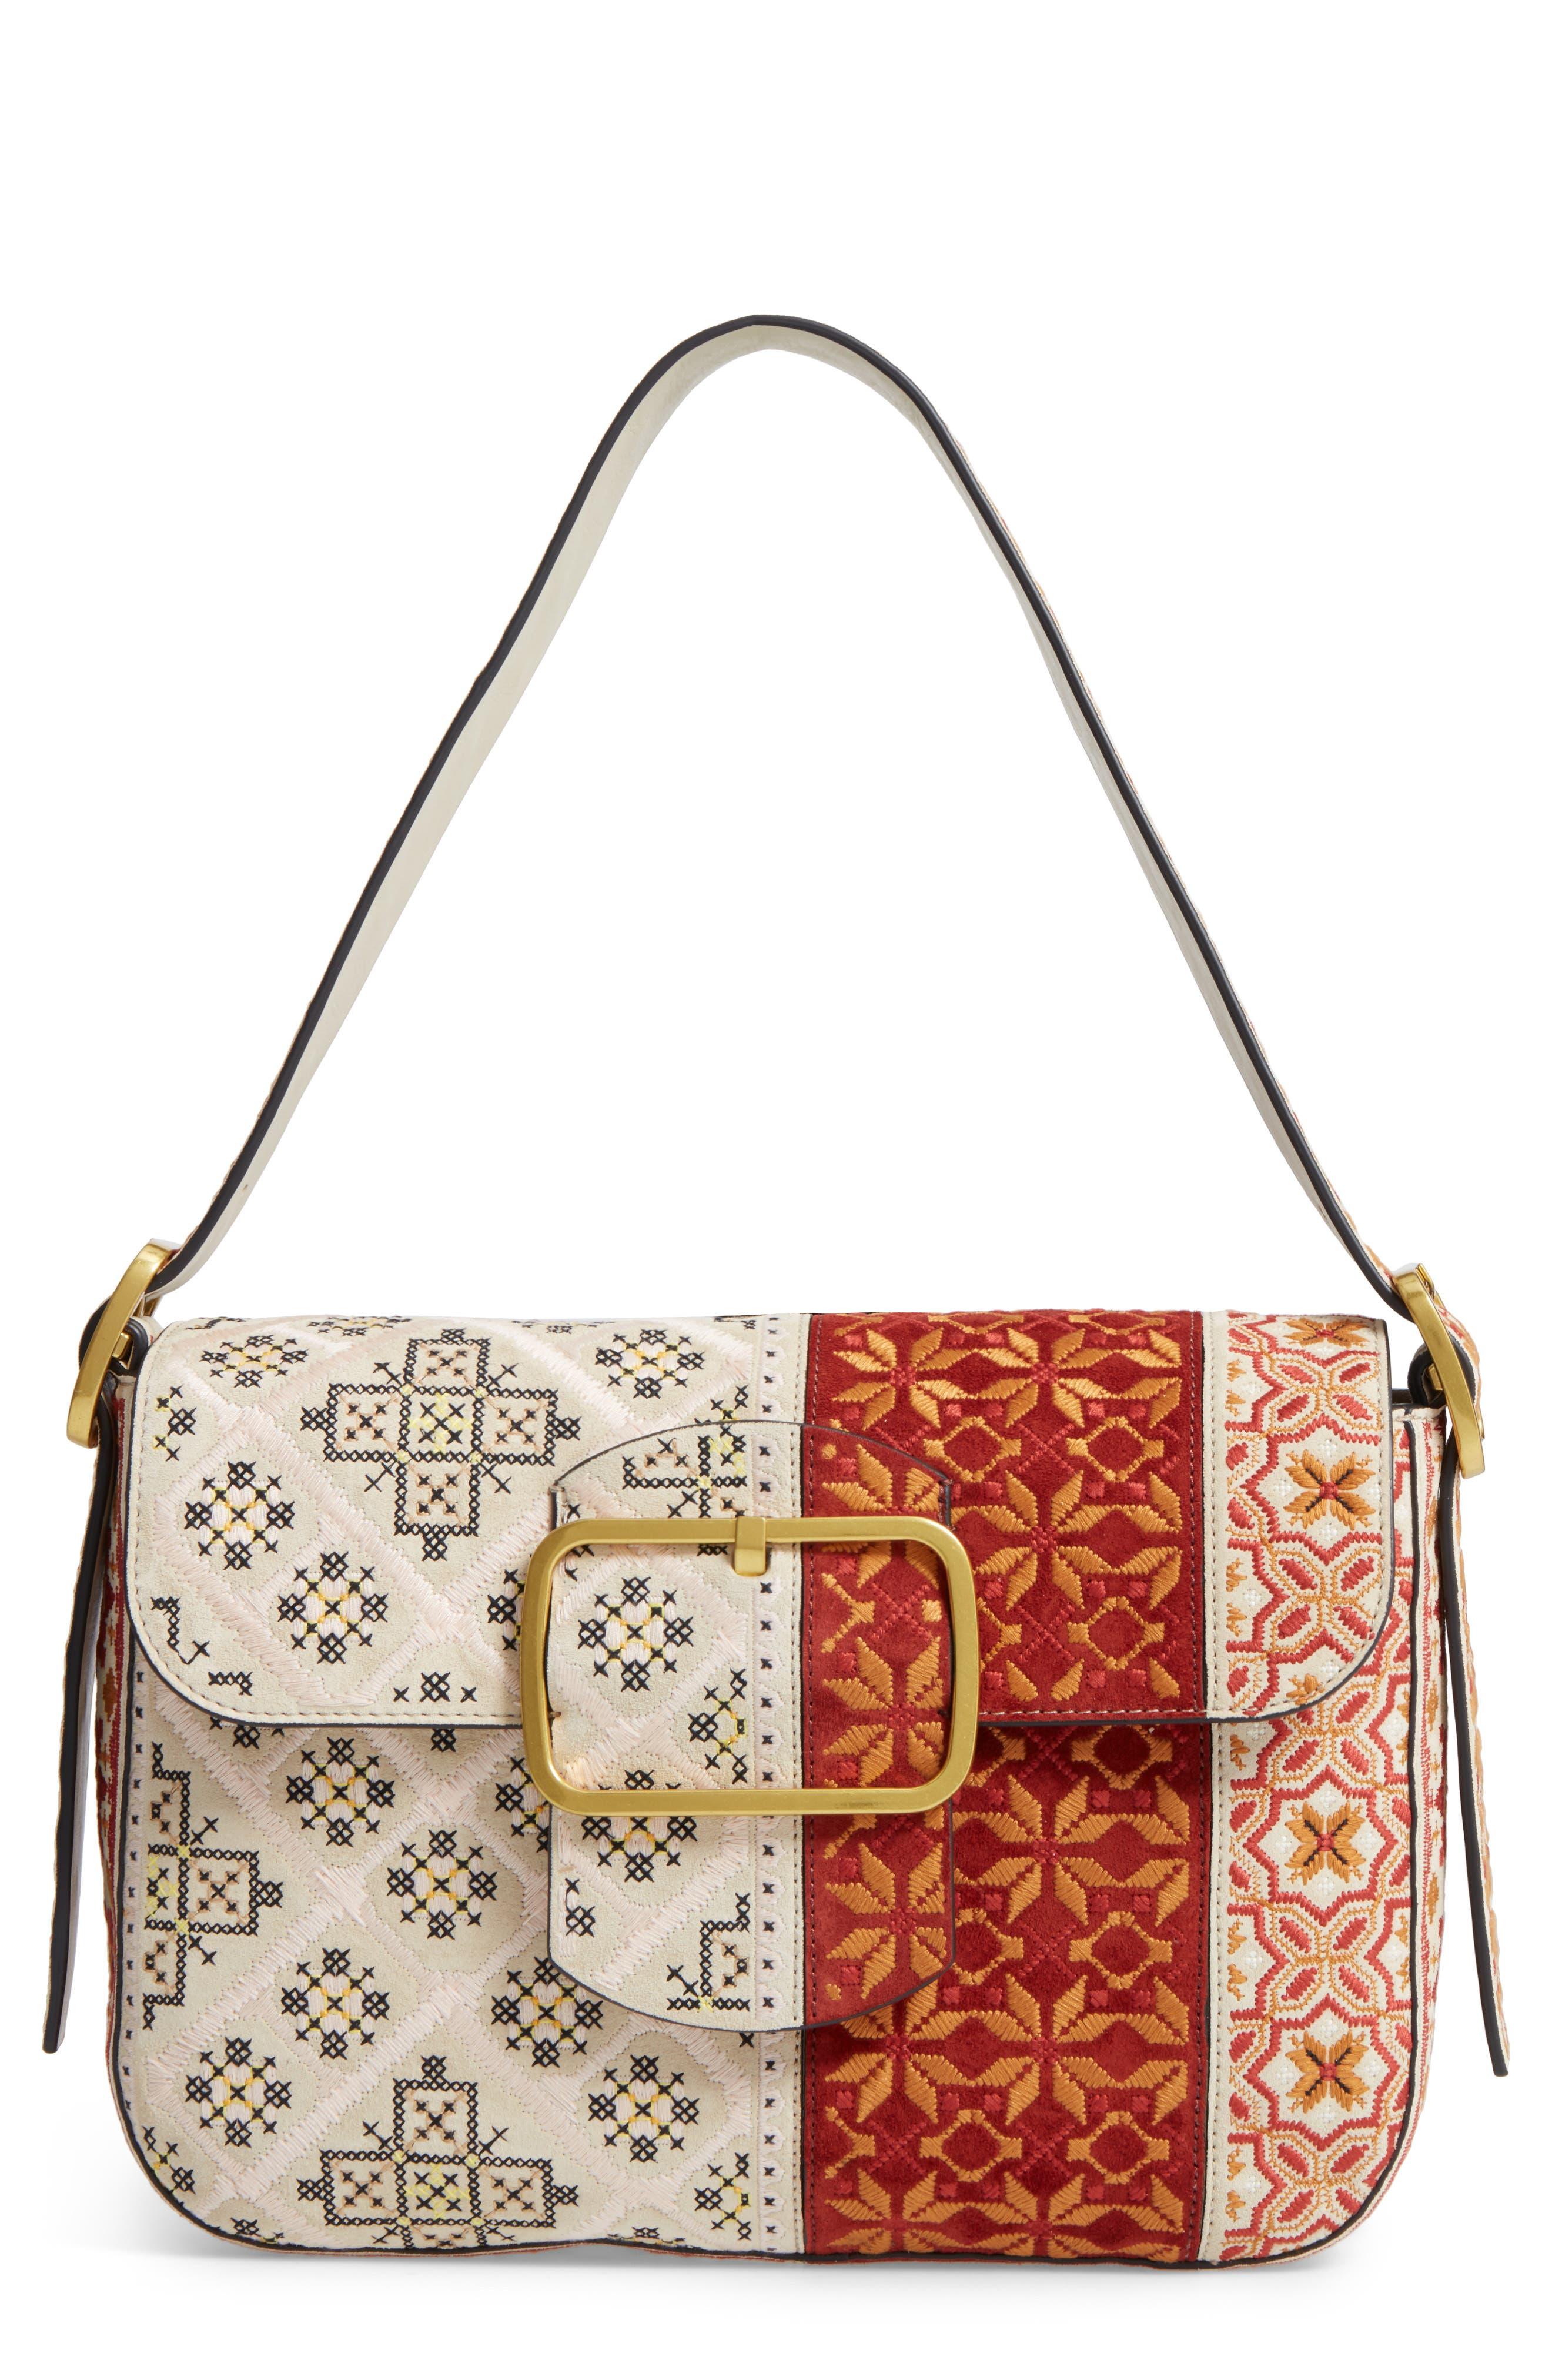 Alternate Image 1 Selected - Tory Burch Sawyer Embroidered Shoulder Bag